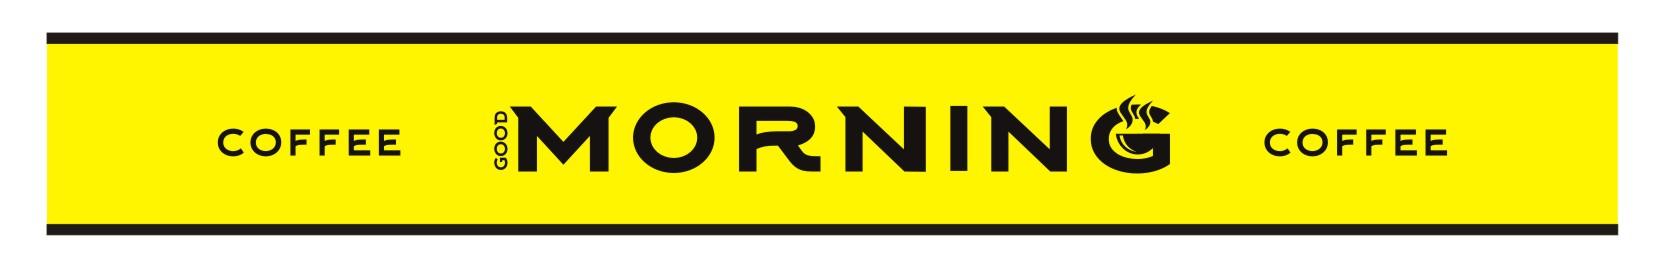 Название, цвета, логотип и дизайн оформления для сети кофеен фото f_0795ba6a3dfaeb87.jpg